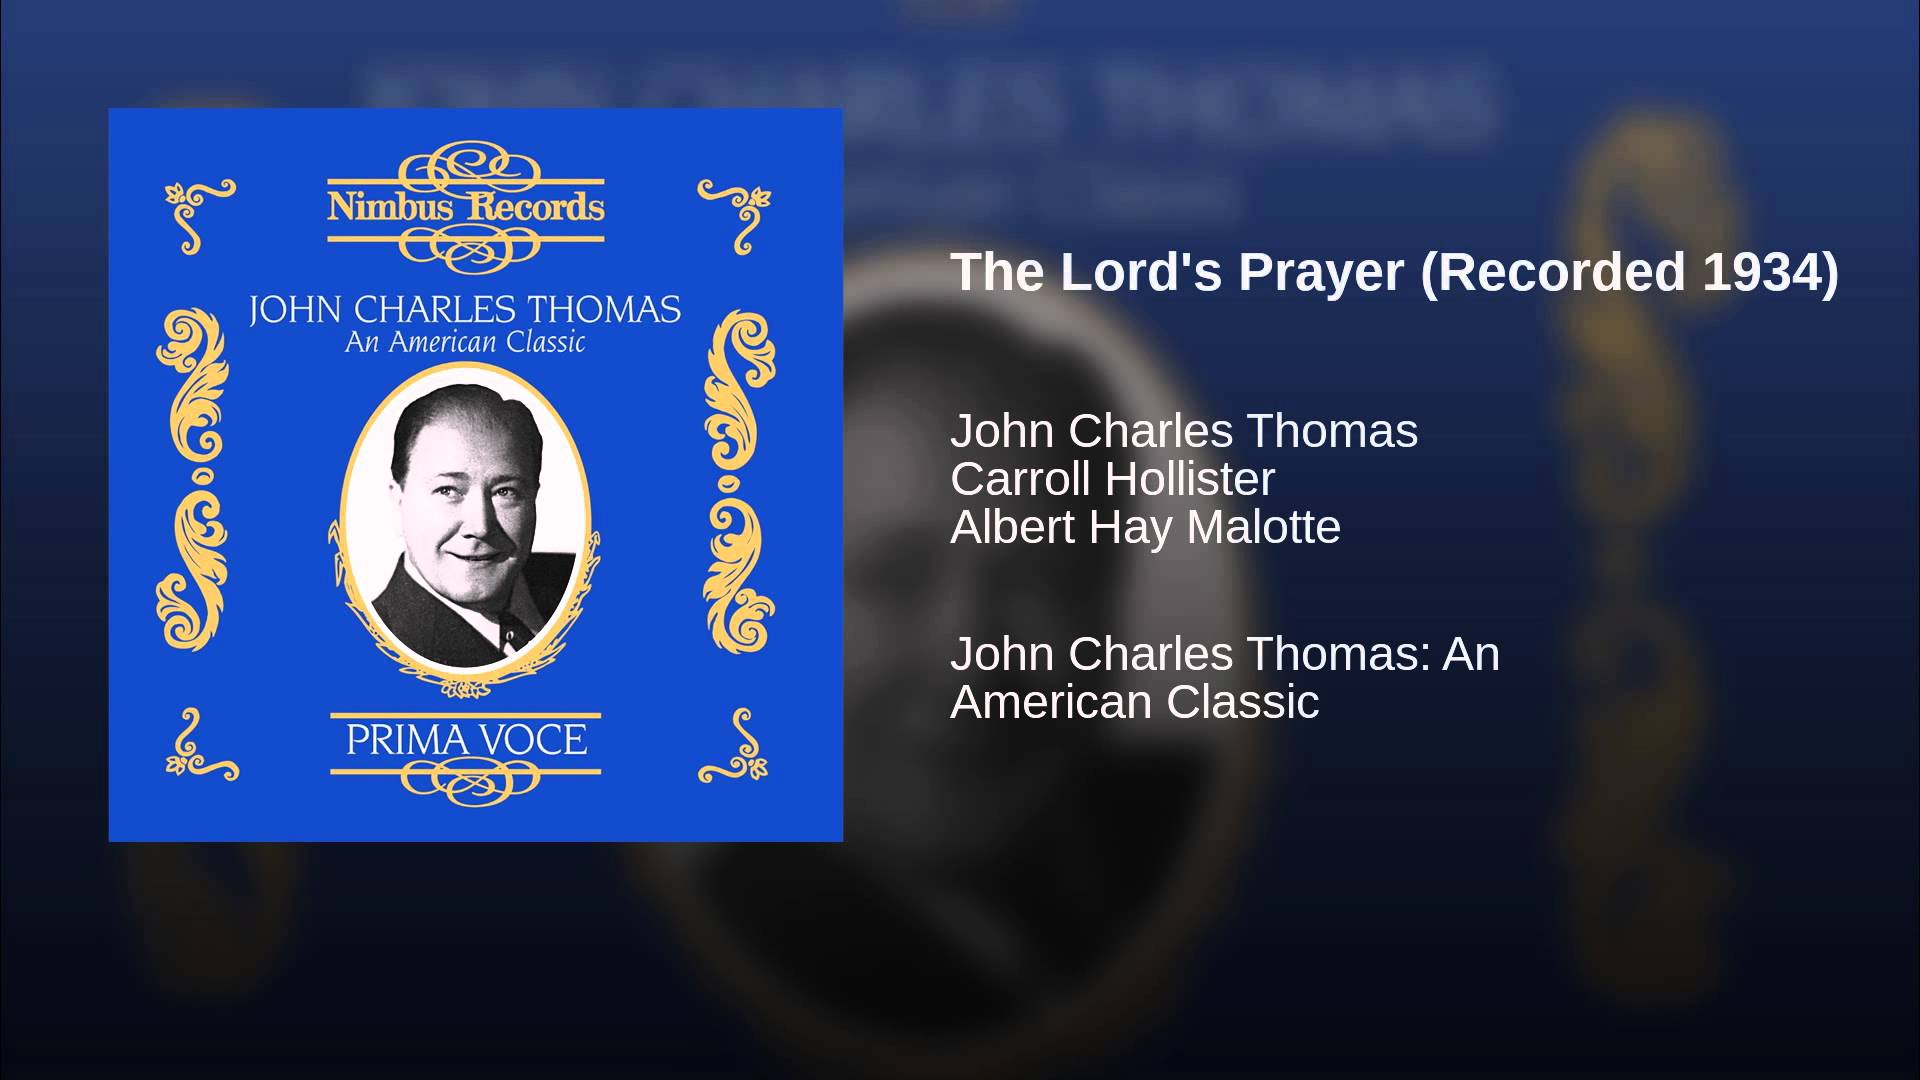 John Charles Thomas sings The Lord's Prayer